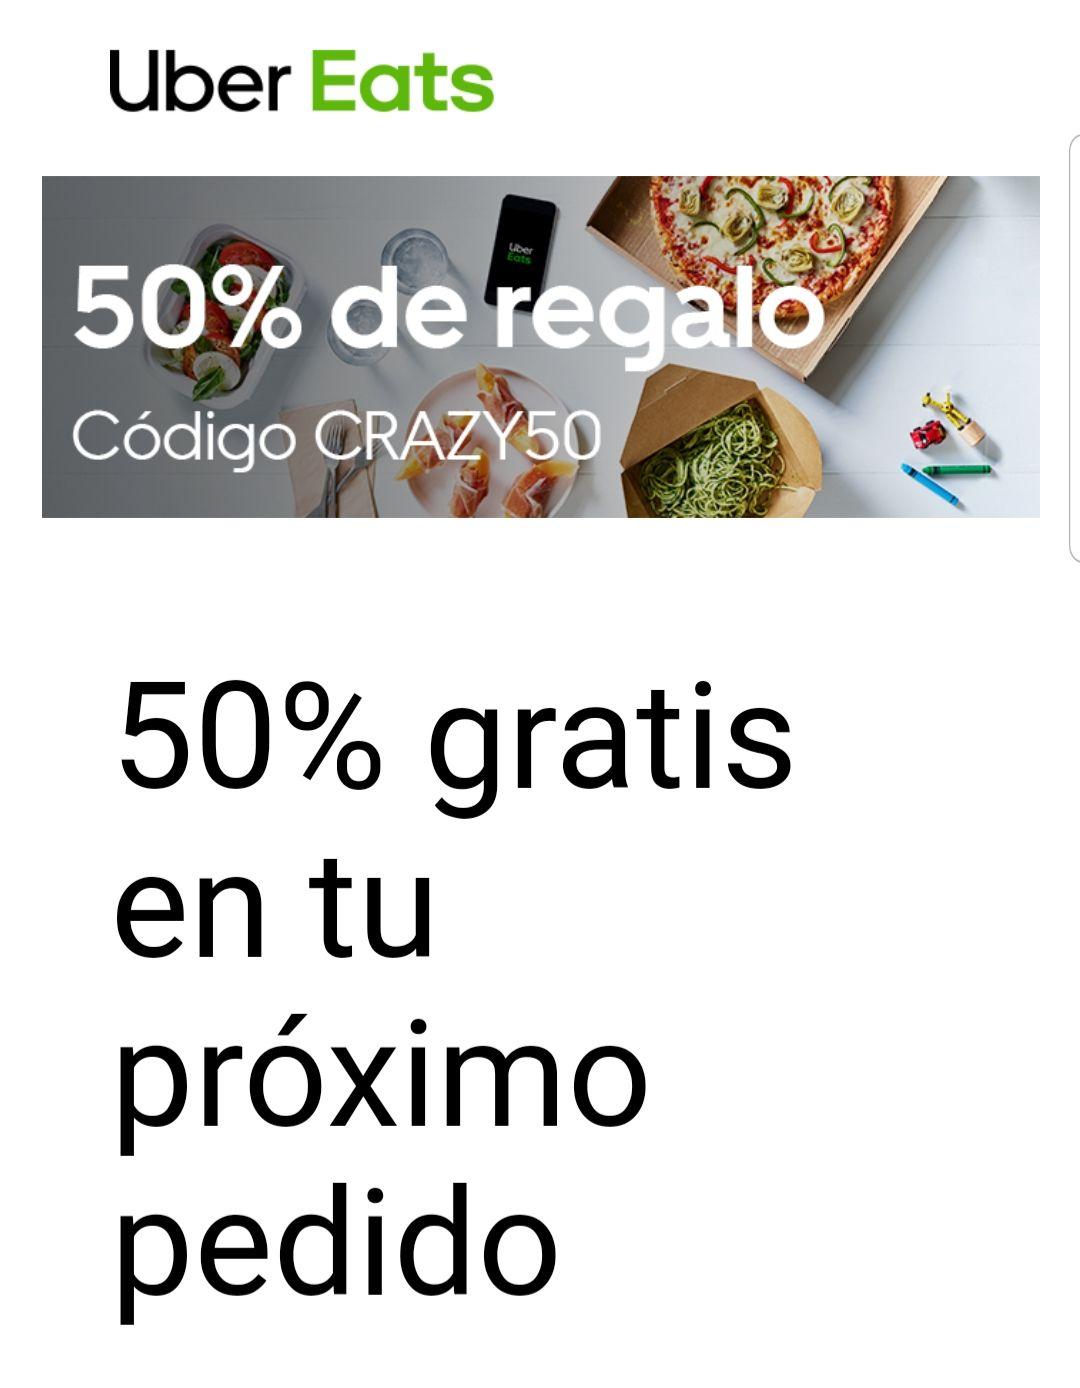 75% descuento en uber eats esta semana